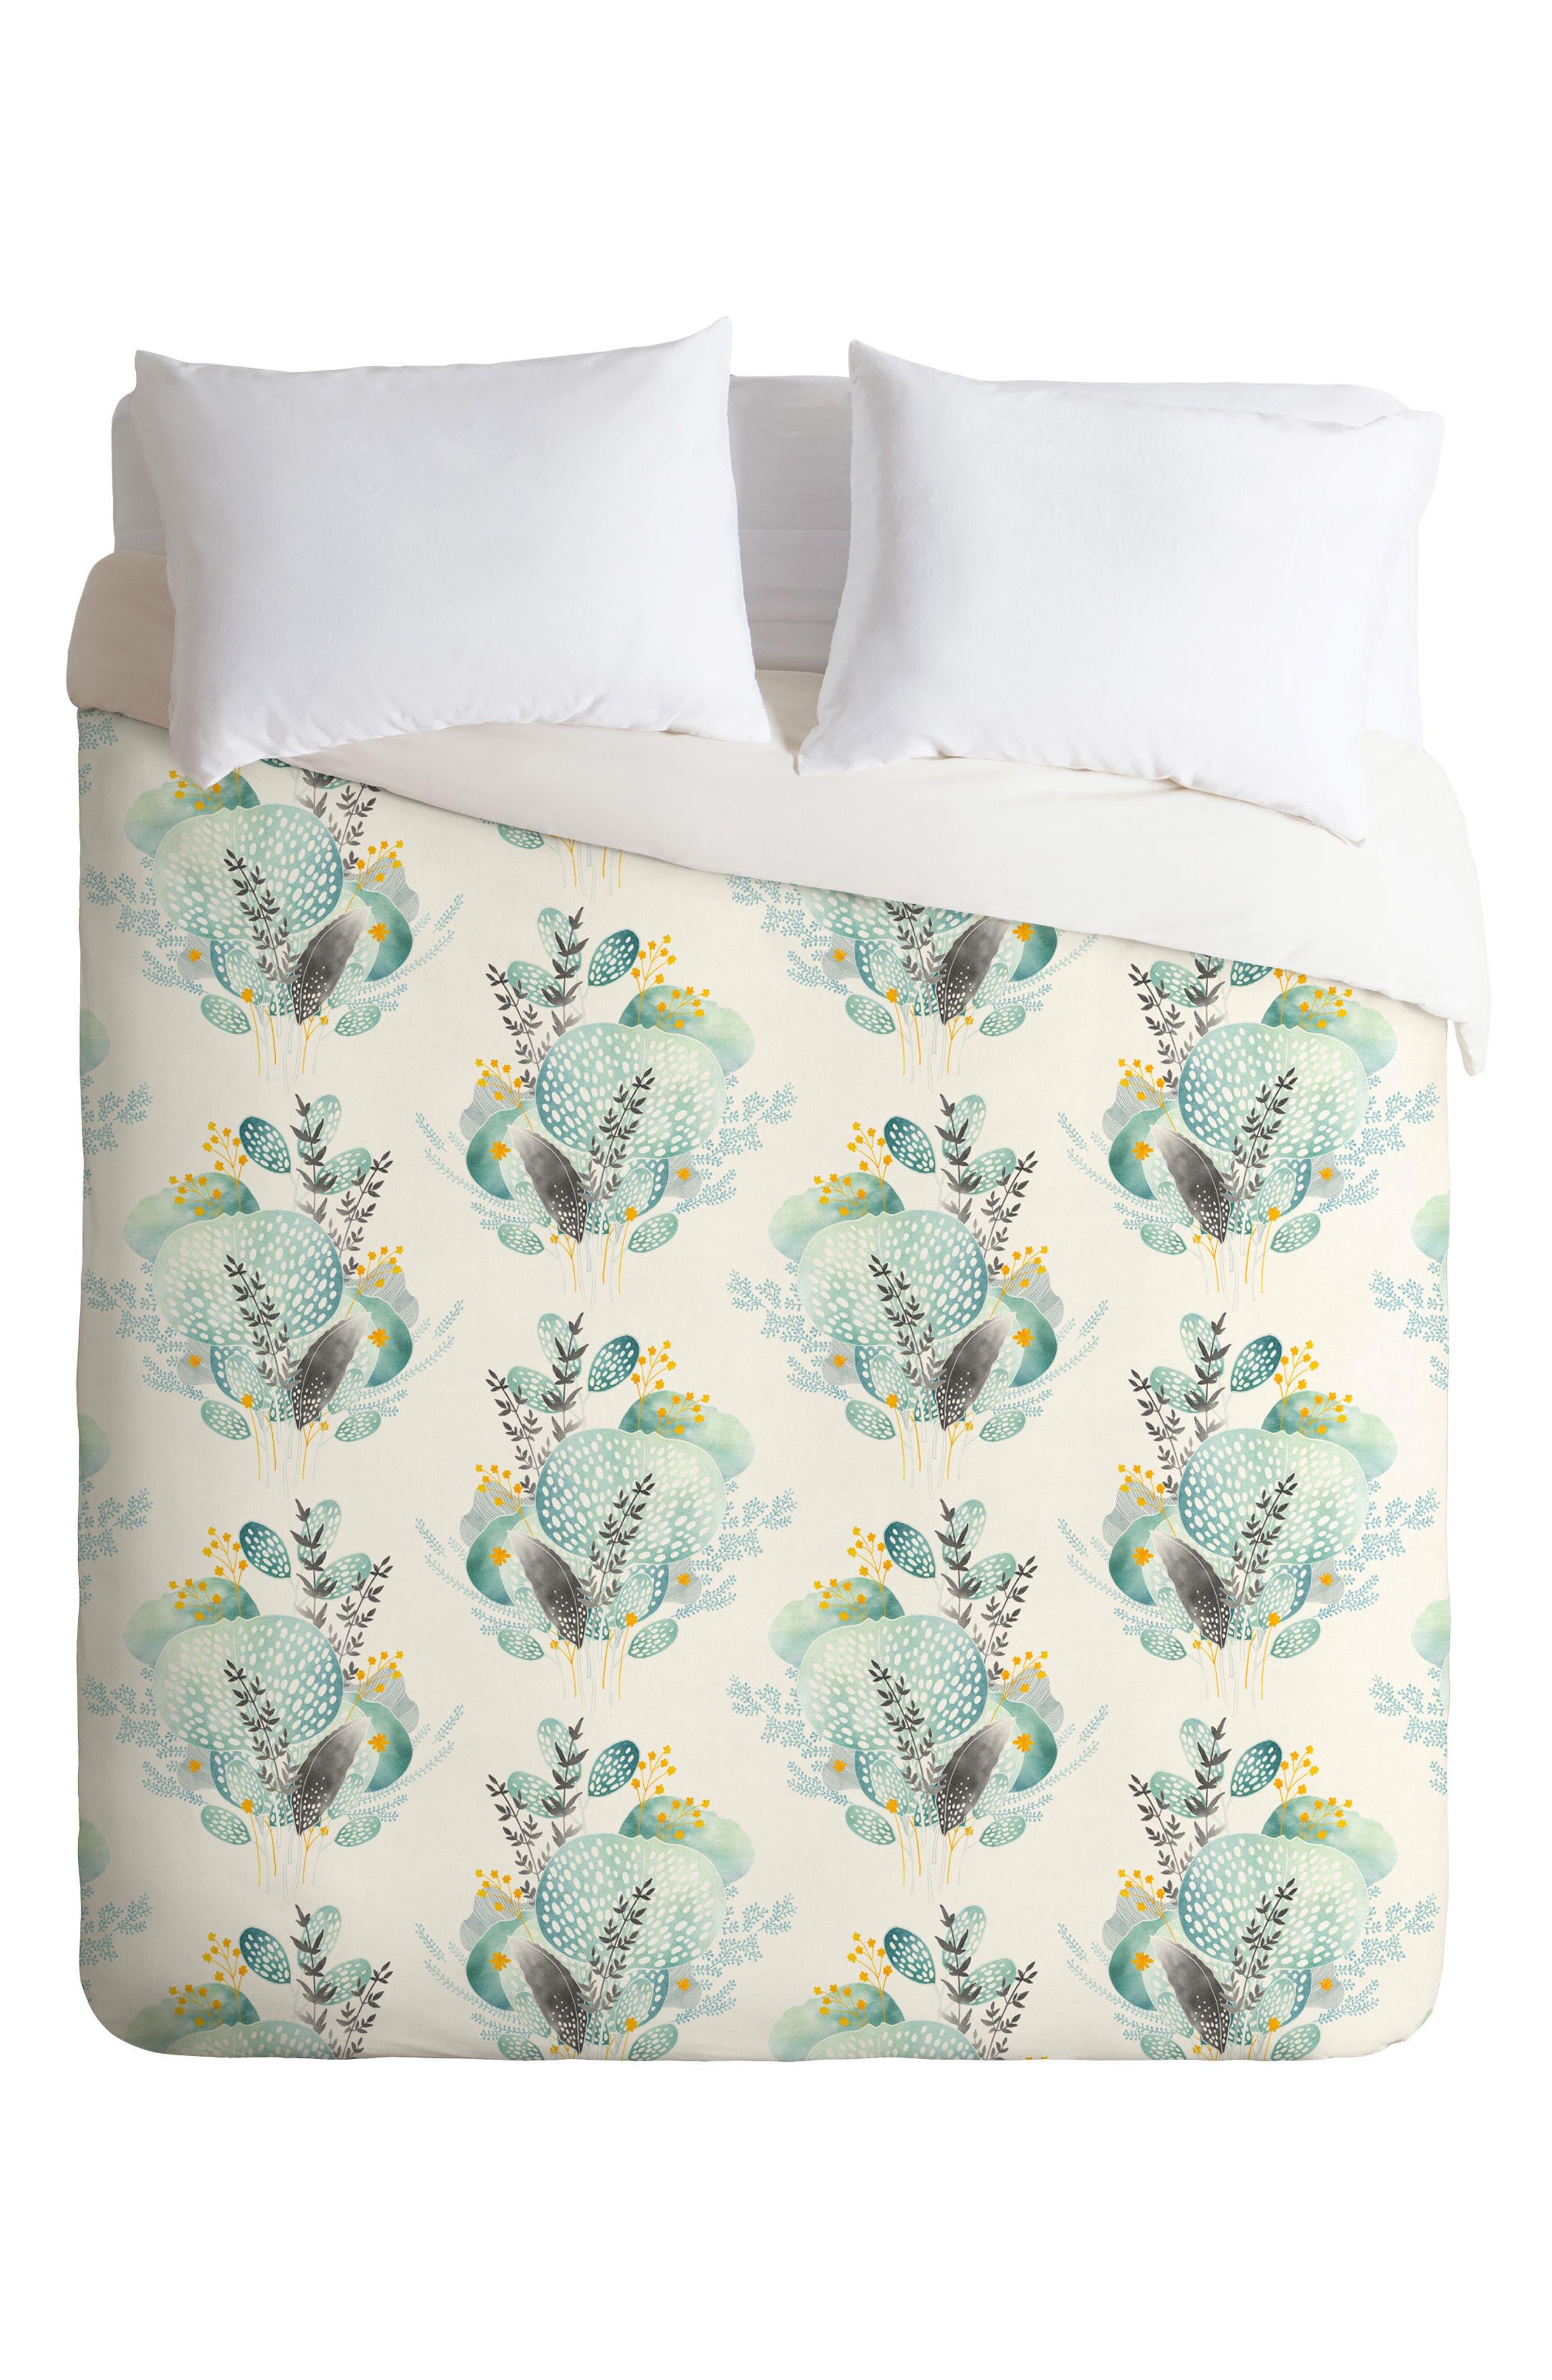 Main Image - Deny Designs Seaflower Duvet Cover & Sham Set